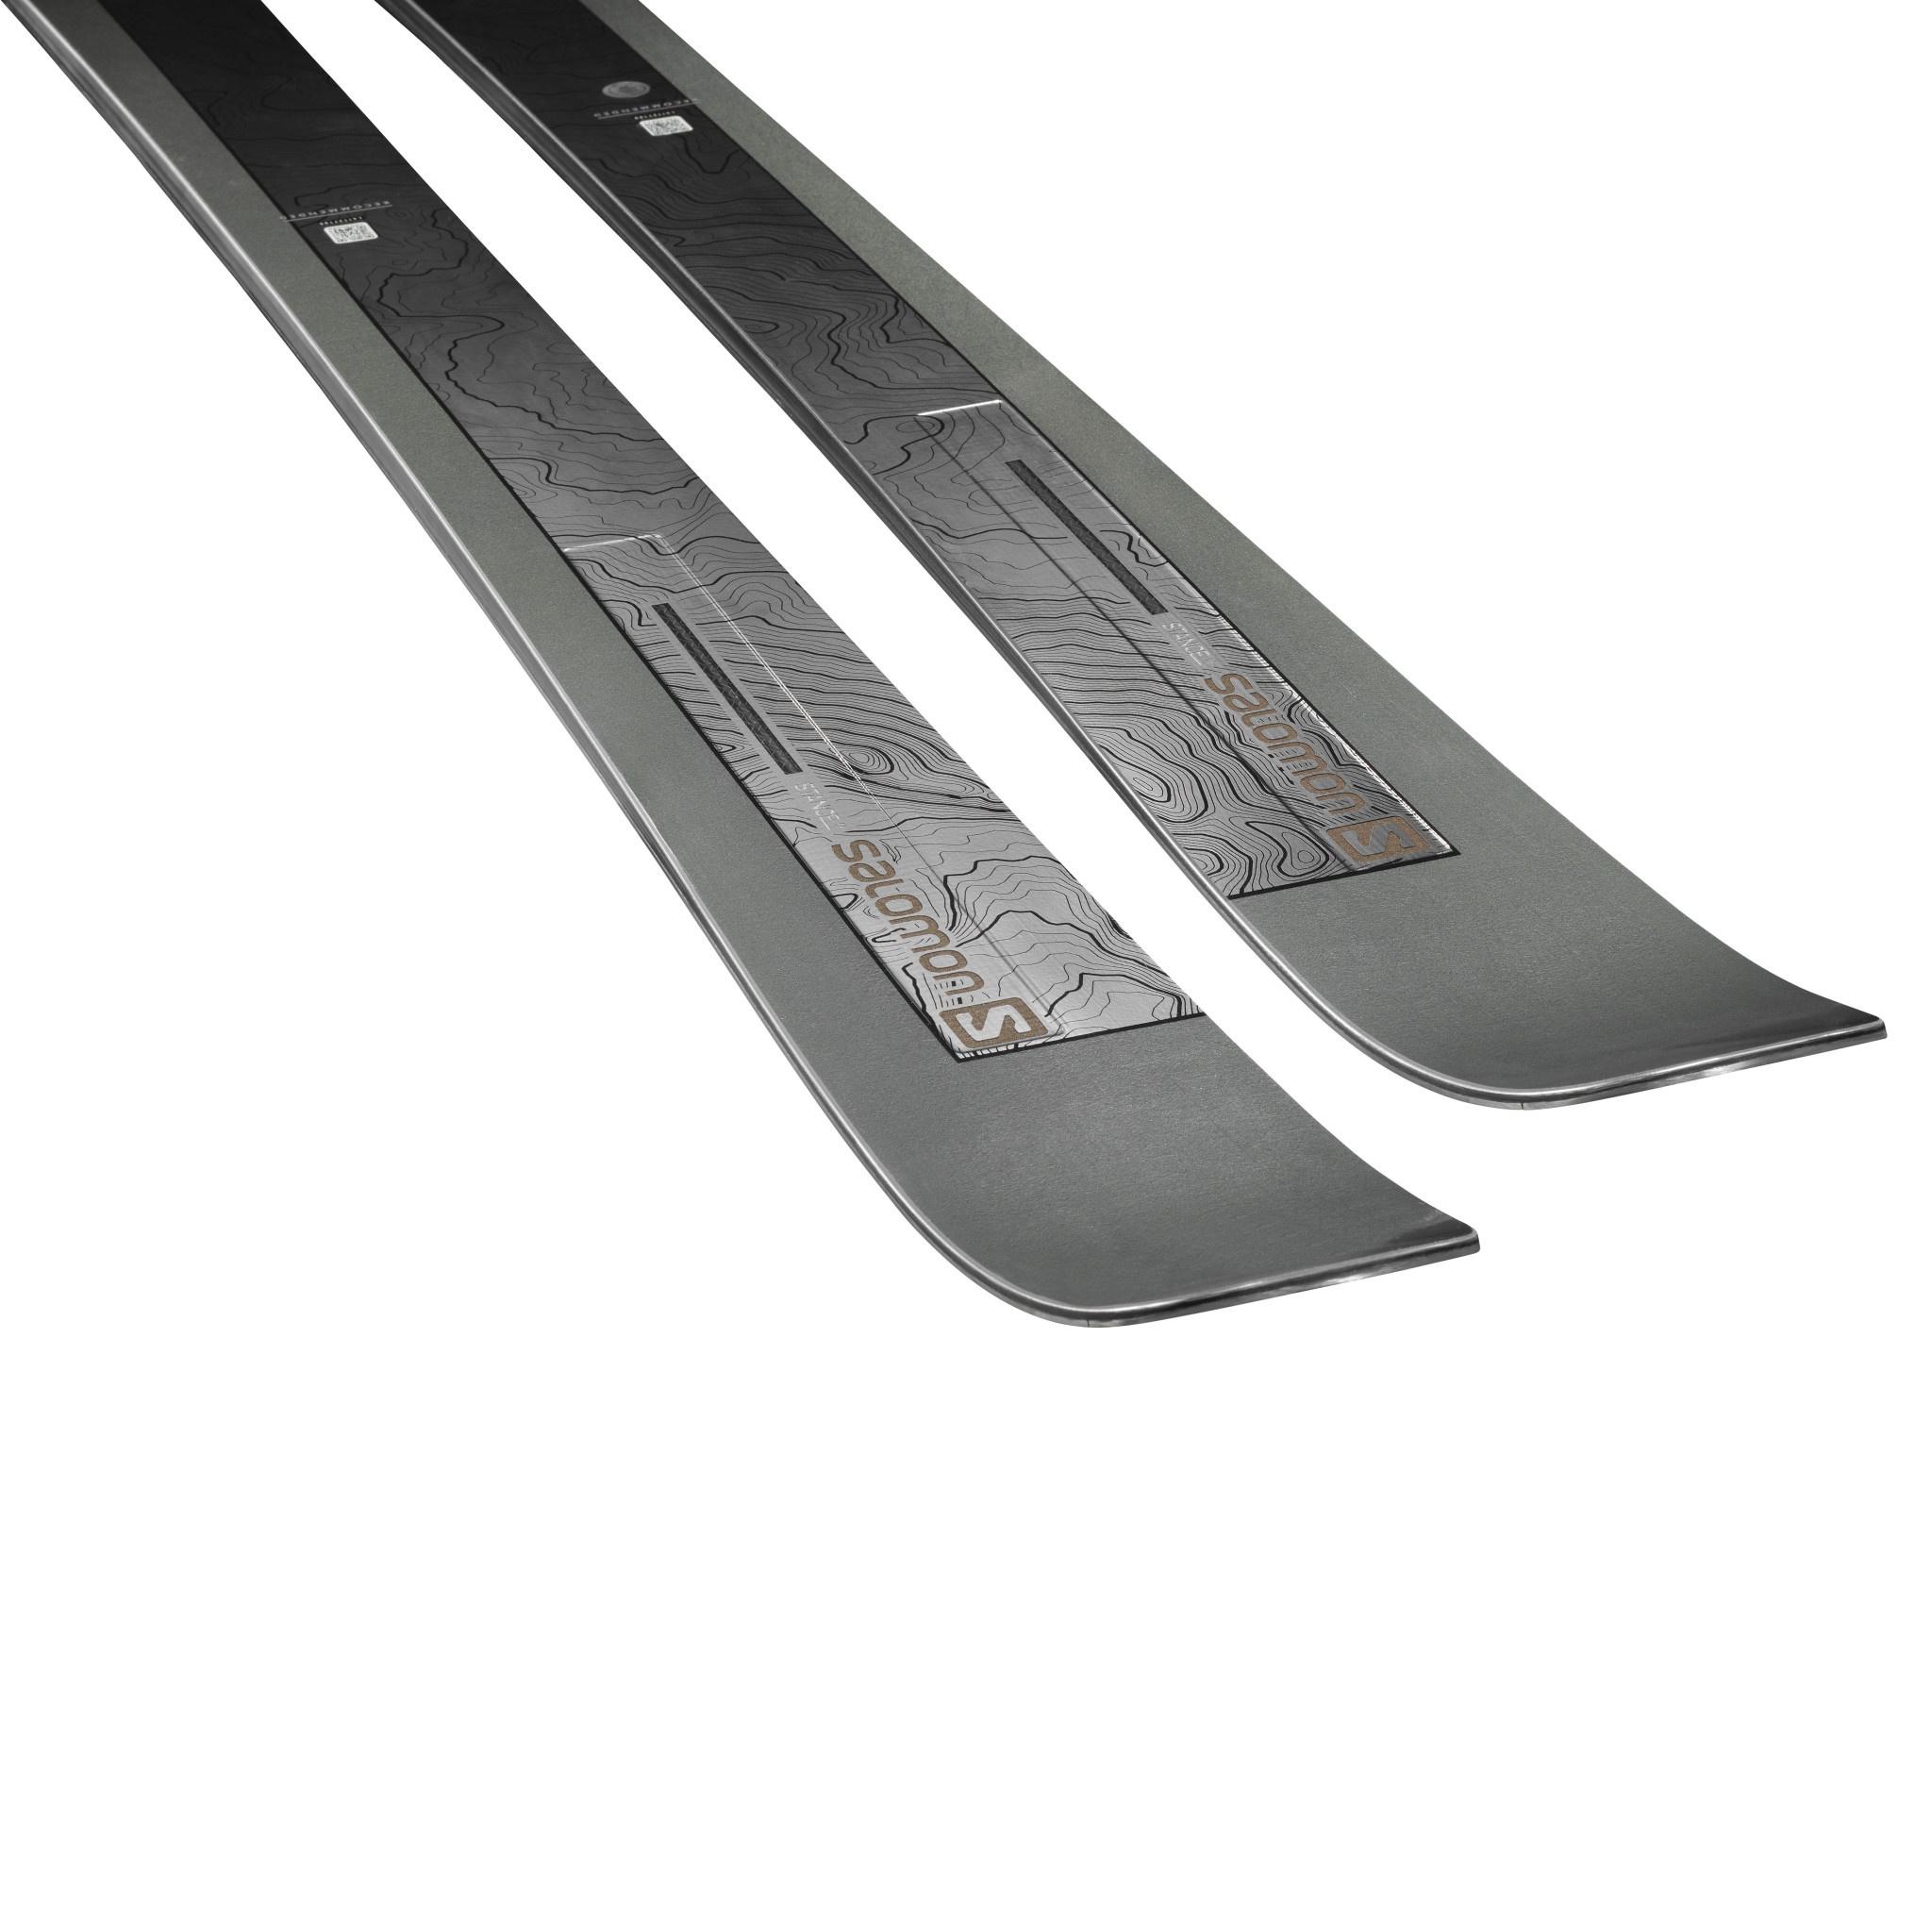 Salomon Ski Salomon Men's Stance 96 Ski (2021)